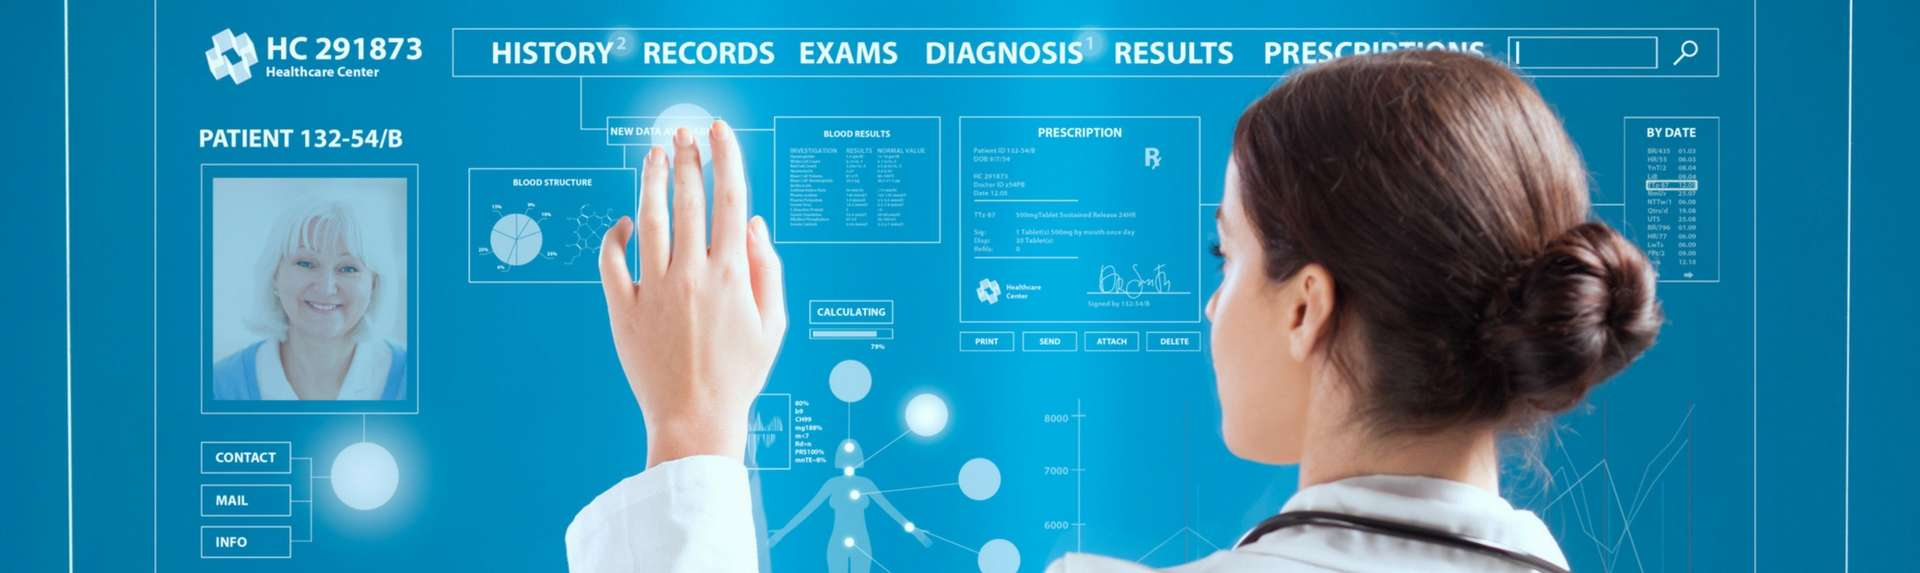 Healthcare Network Assessment